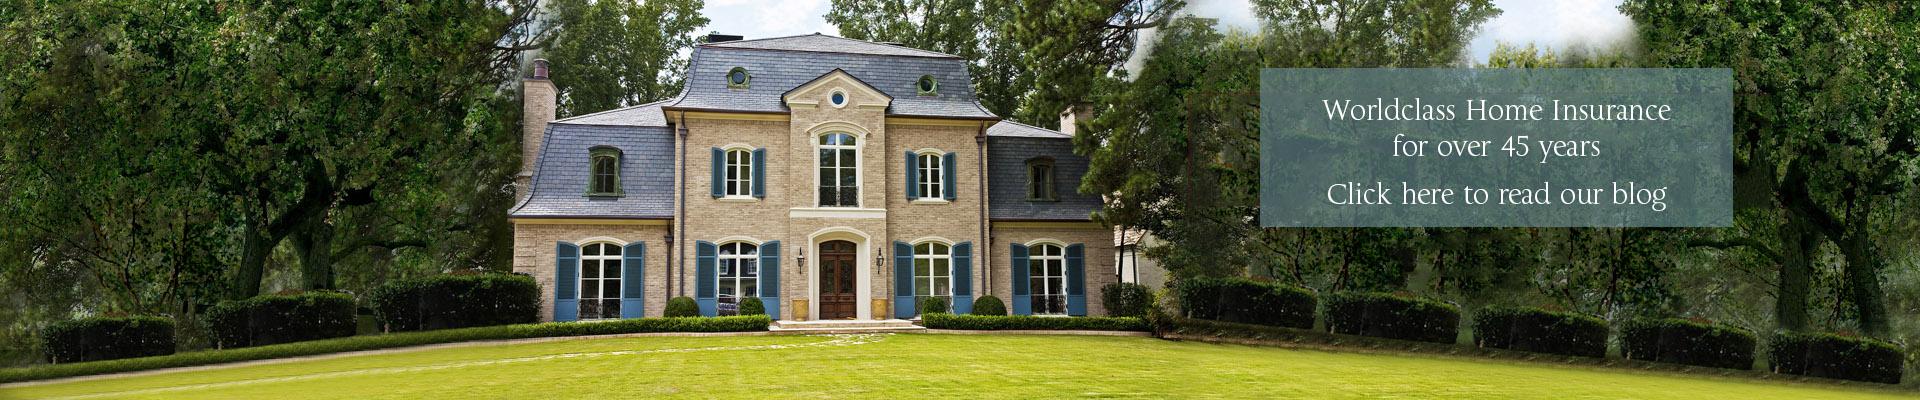 House_blue